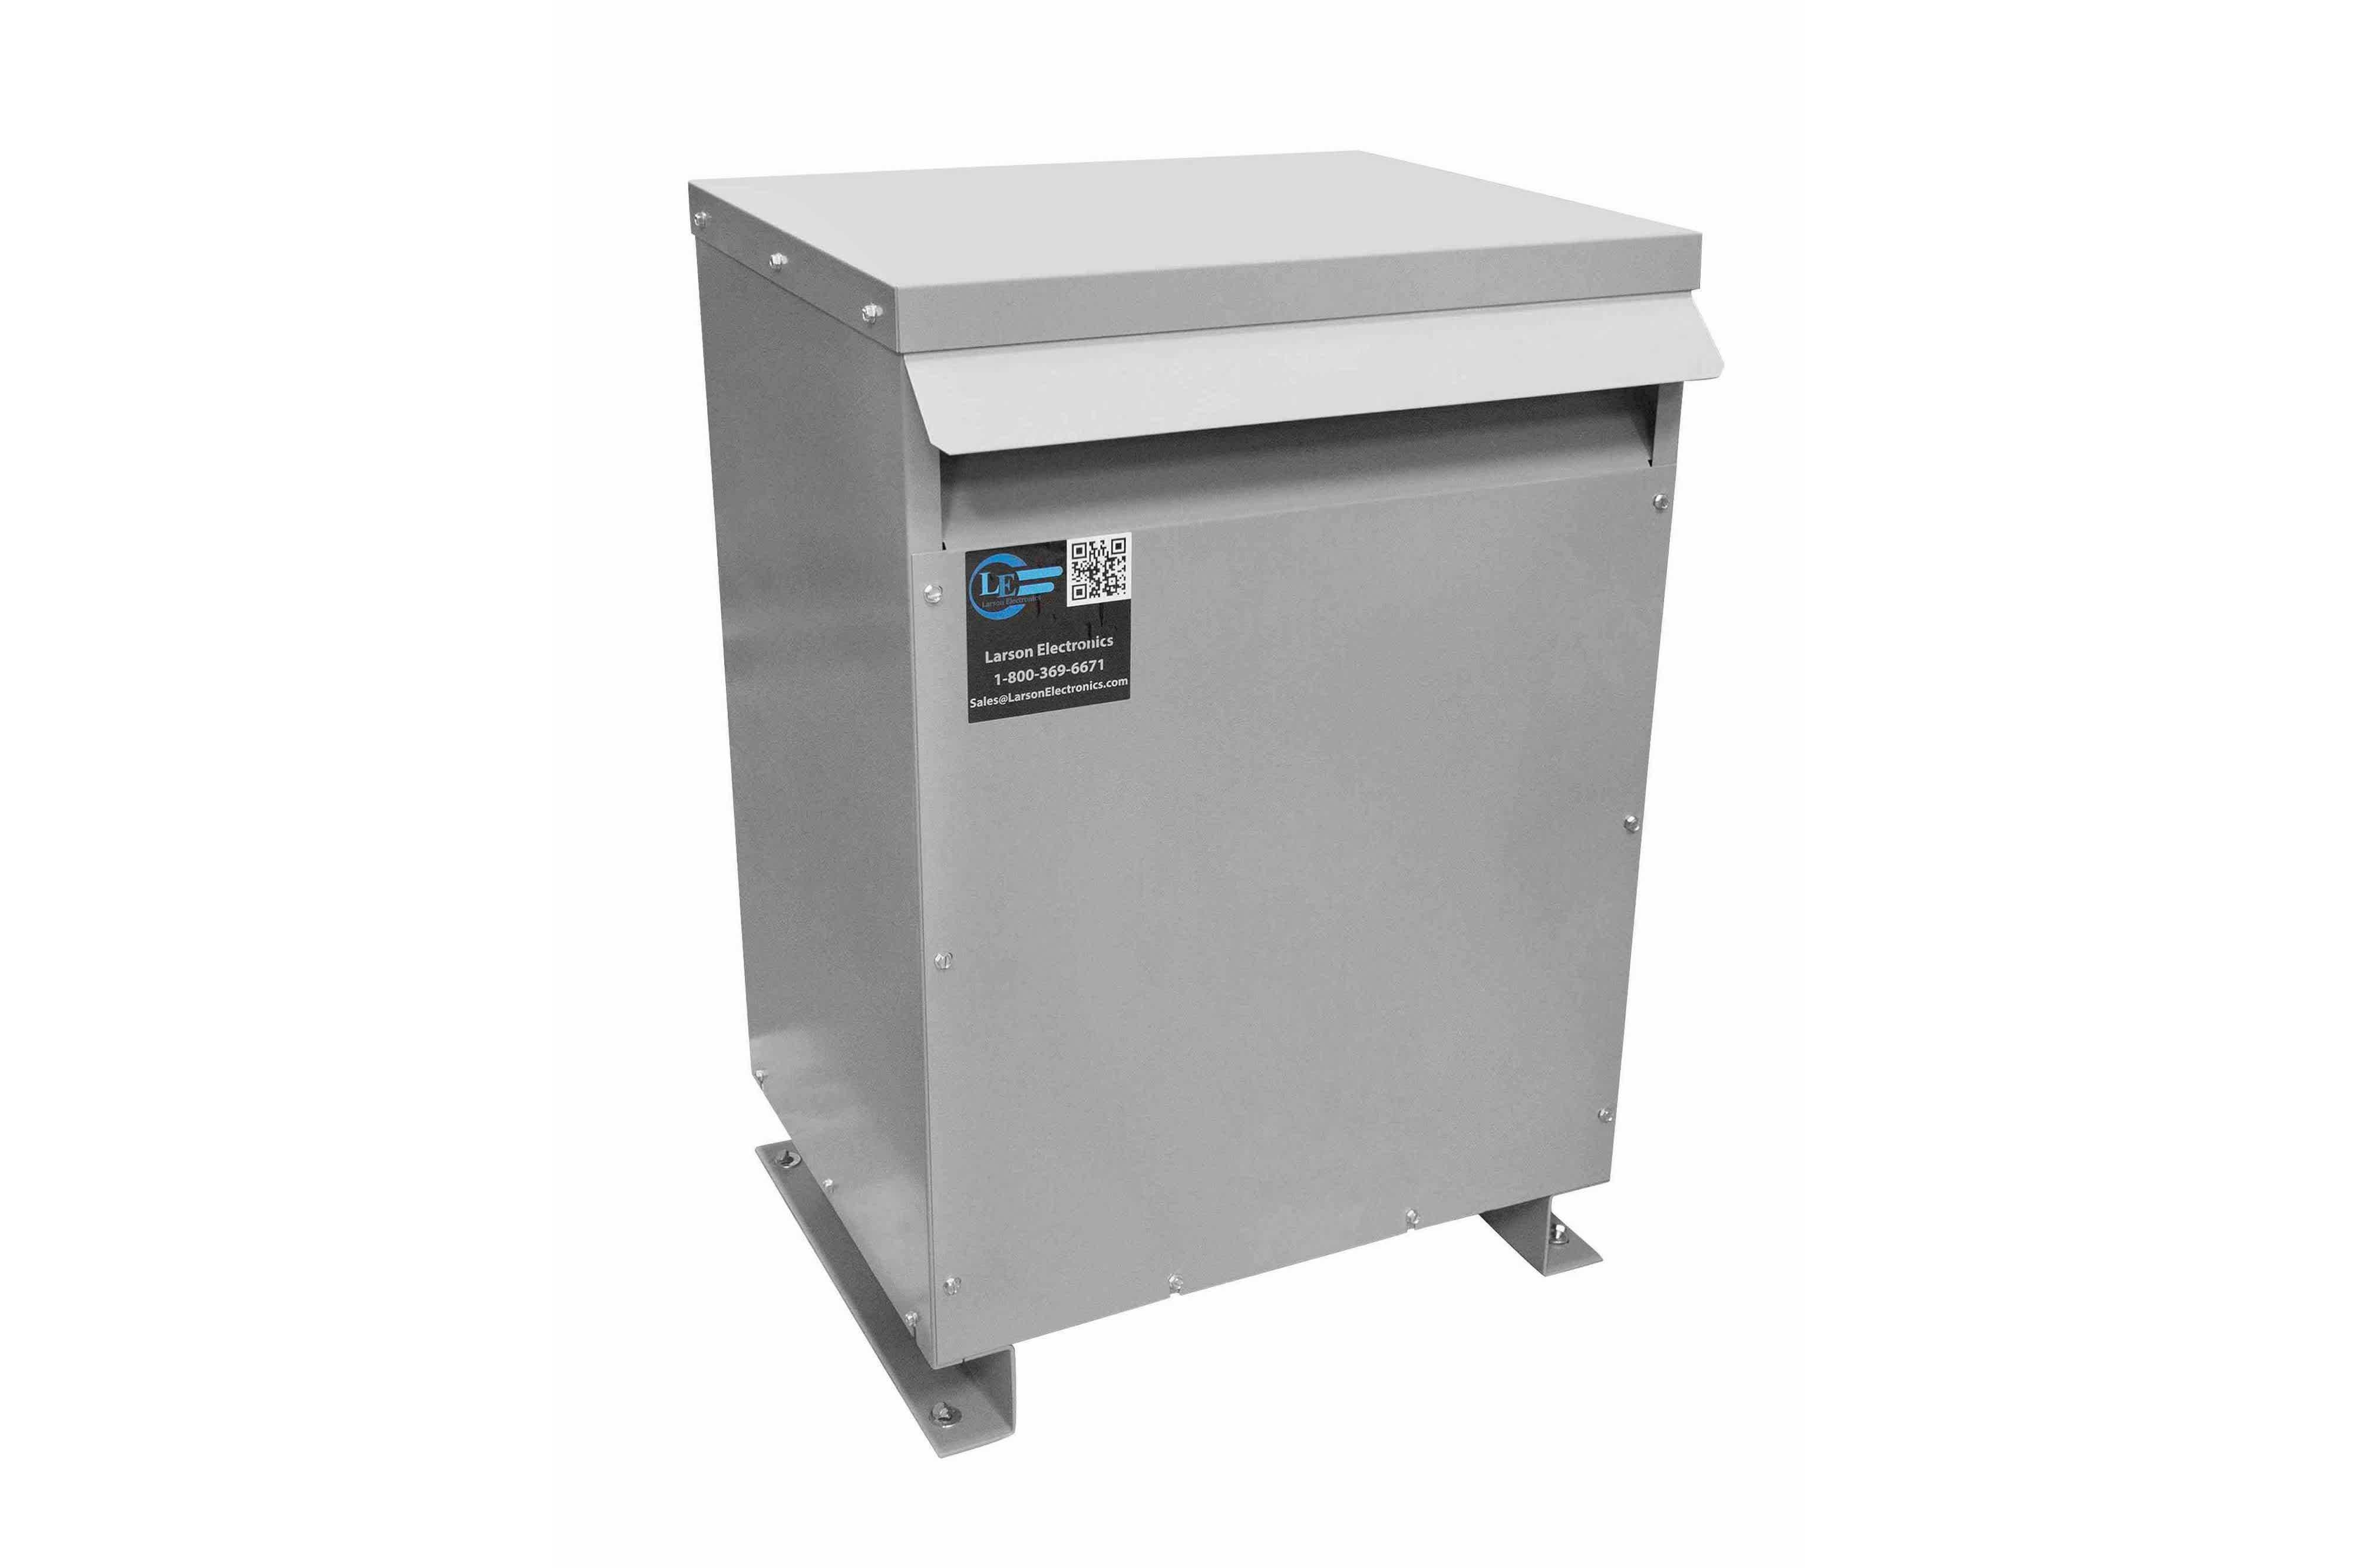 80 kVA 3PH DOE Transformer, 208V Delta Primary, 415Y/240 Wye-N Secondary, N3R, Ventilated, 60 Hz